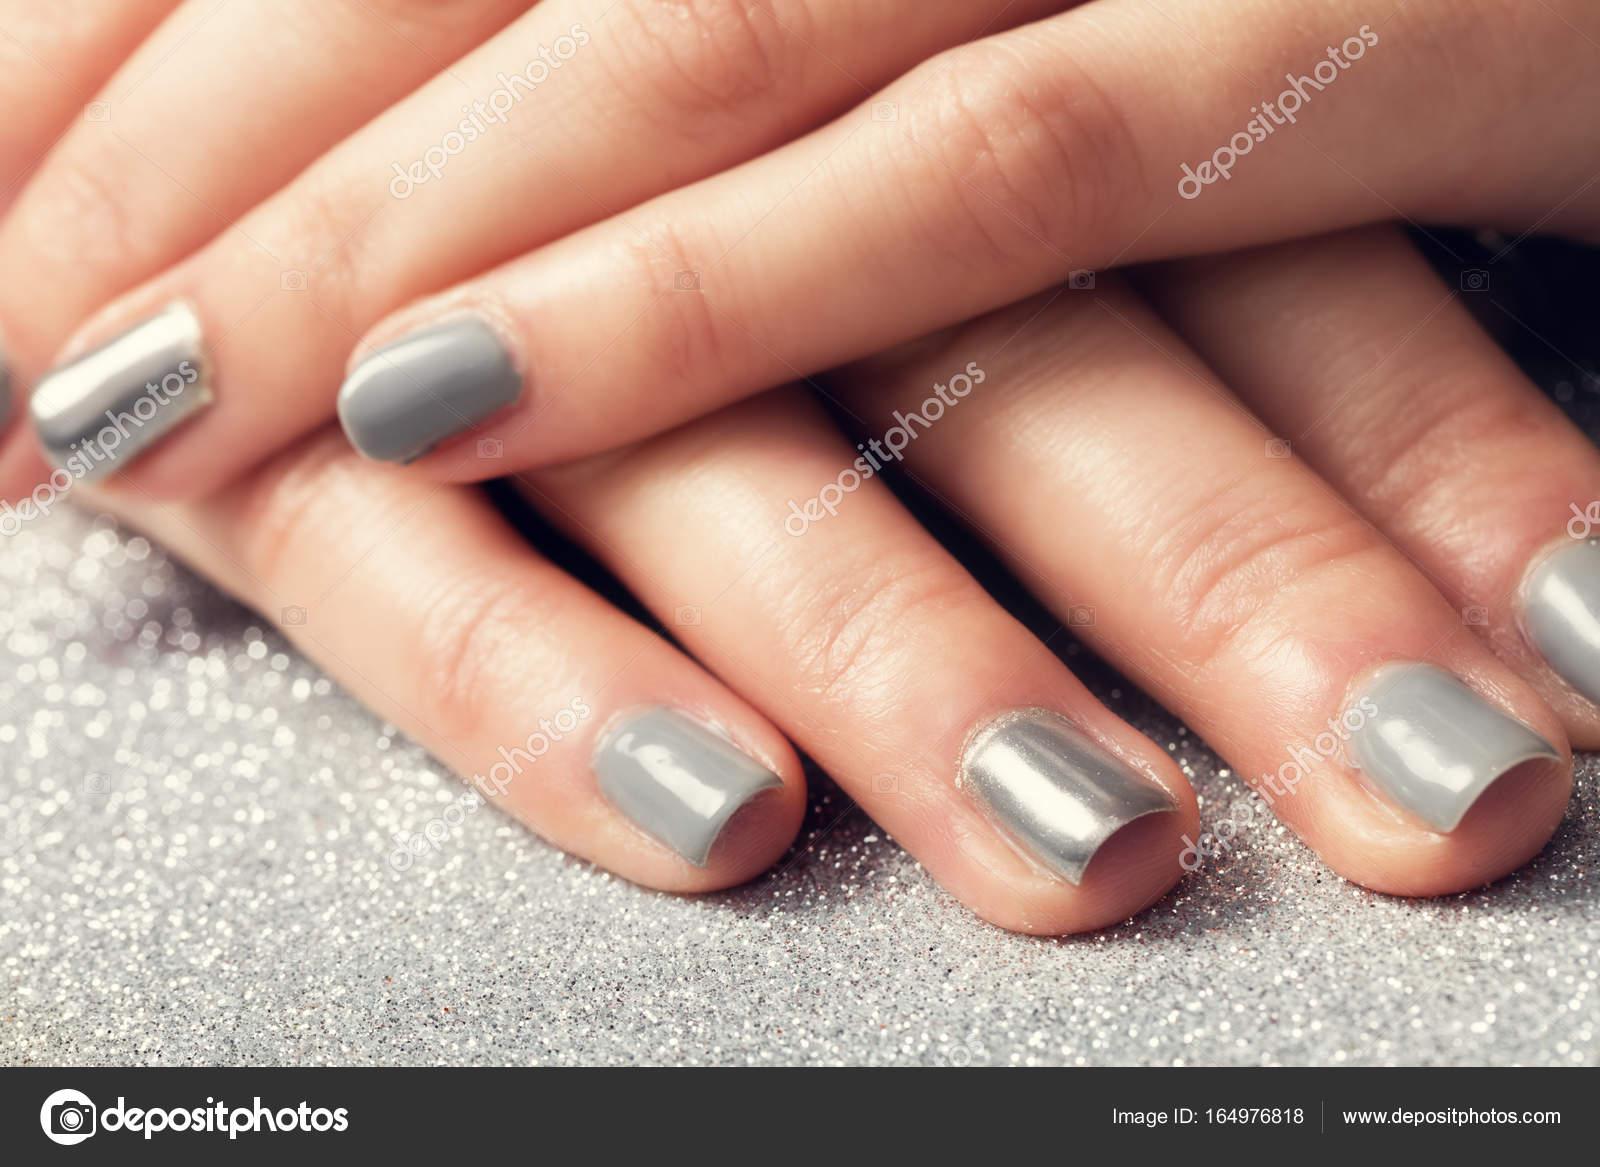 Frau Nägel mit glänzenden Silber Hybrid Maniküre — Stockfoto ...